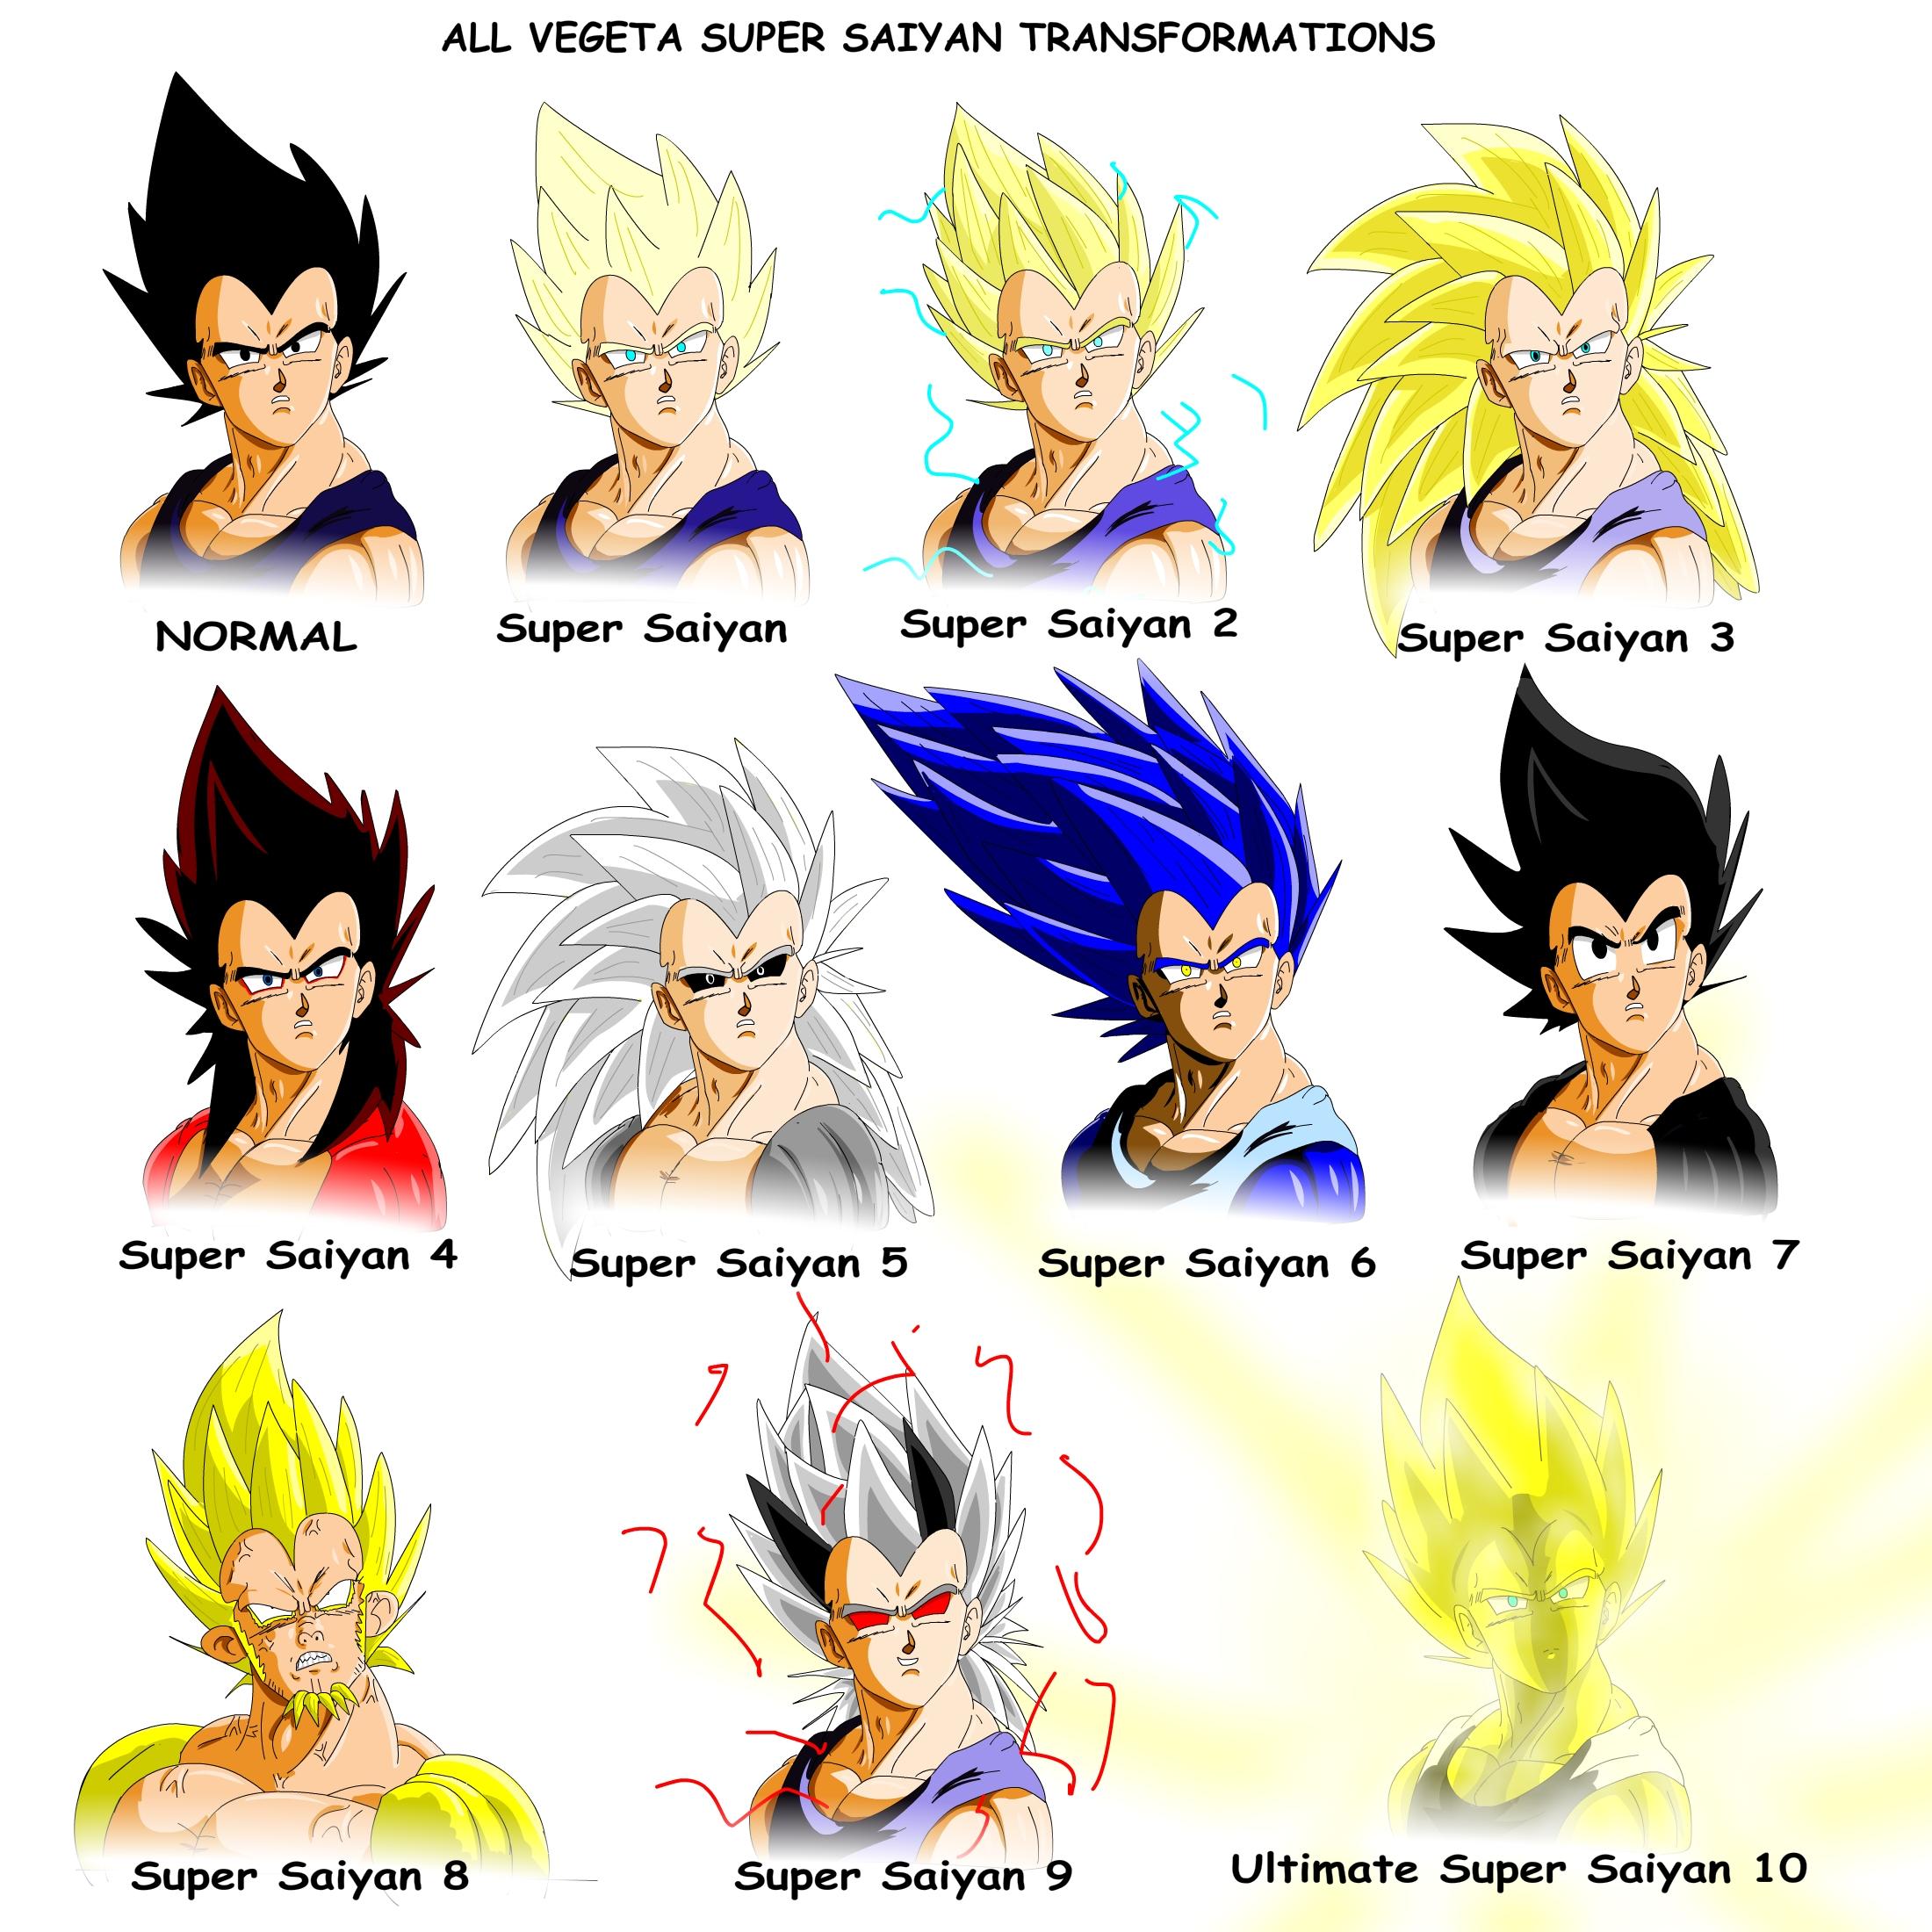 All Vegeta Super Saiyan Transformations by bocodamondo